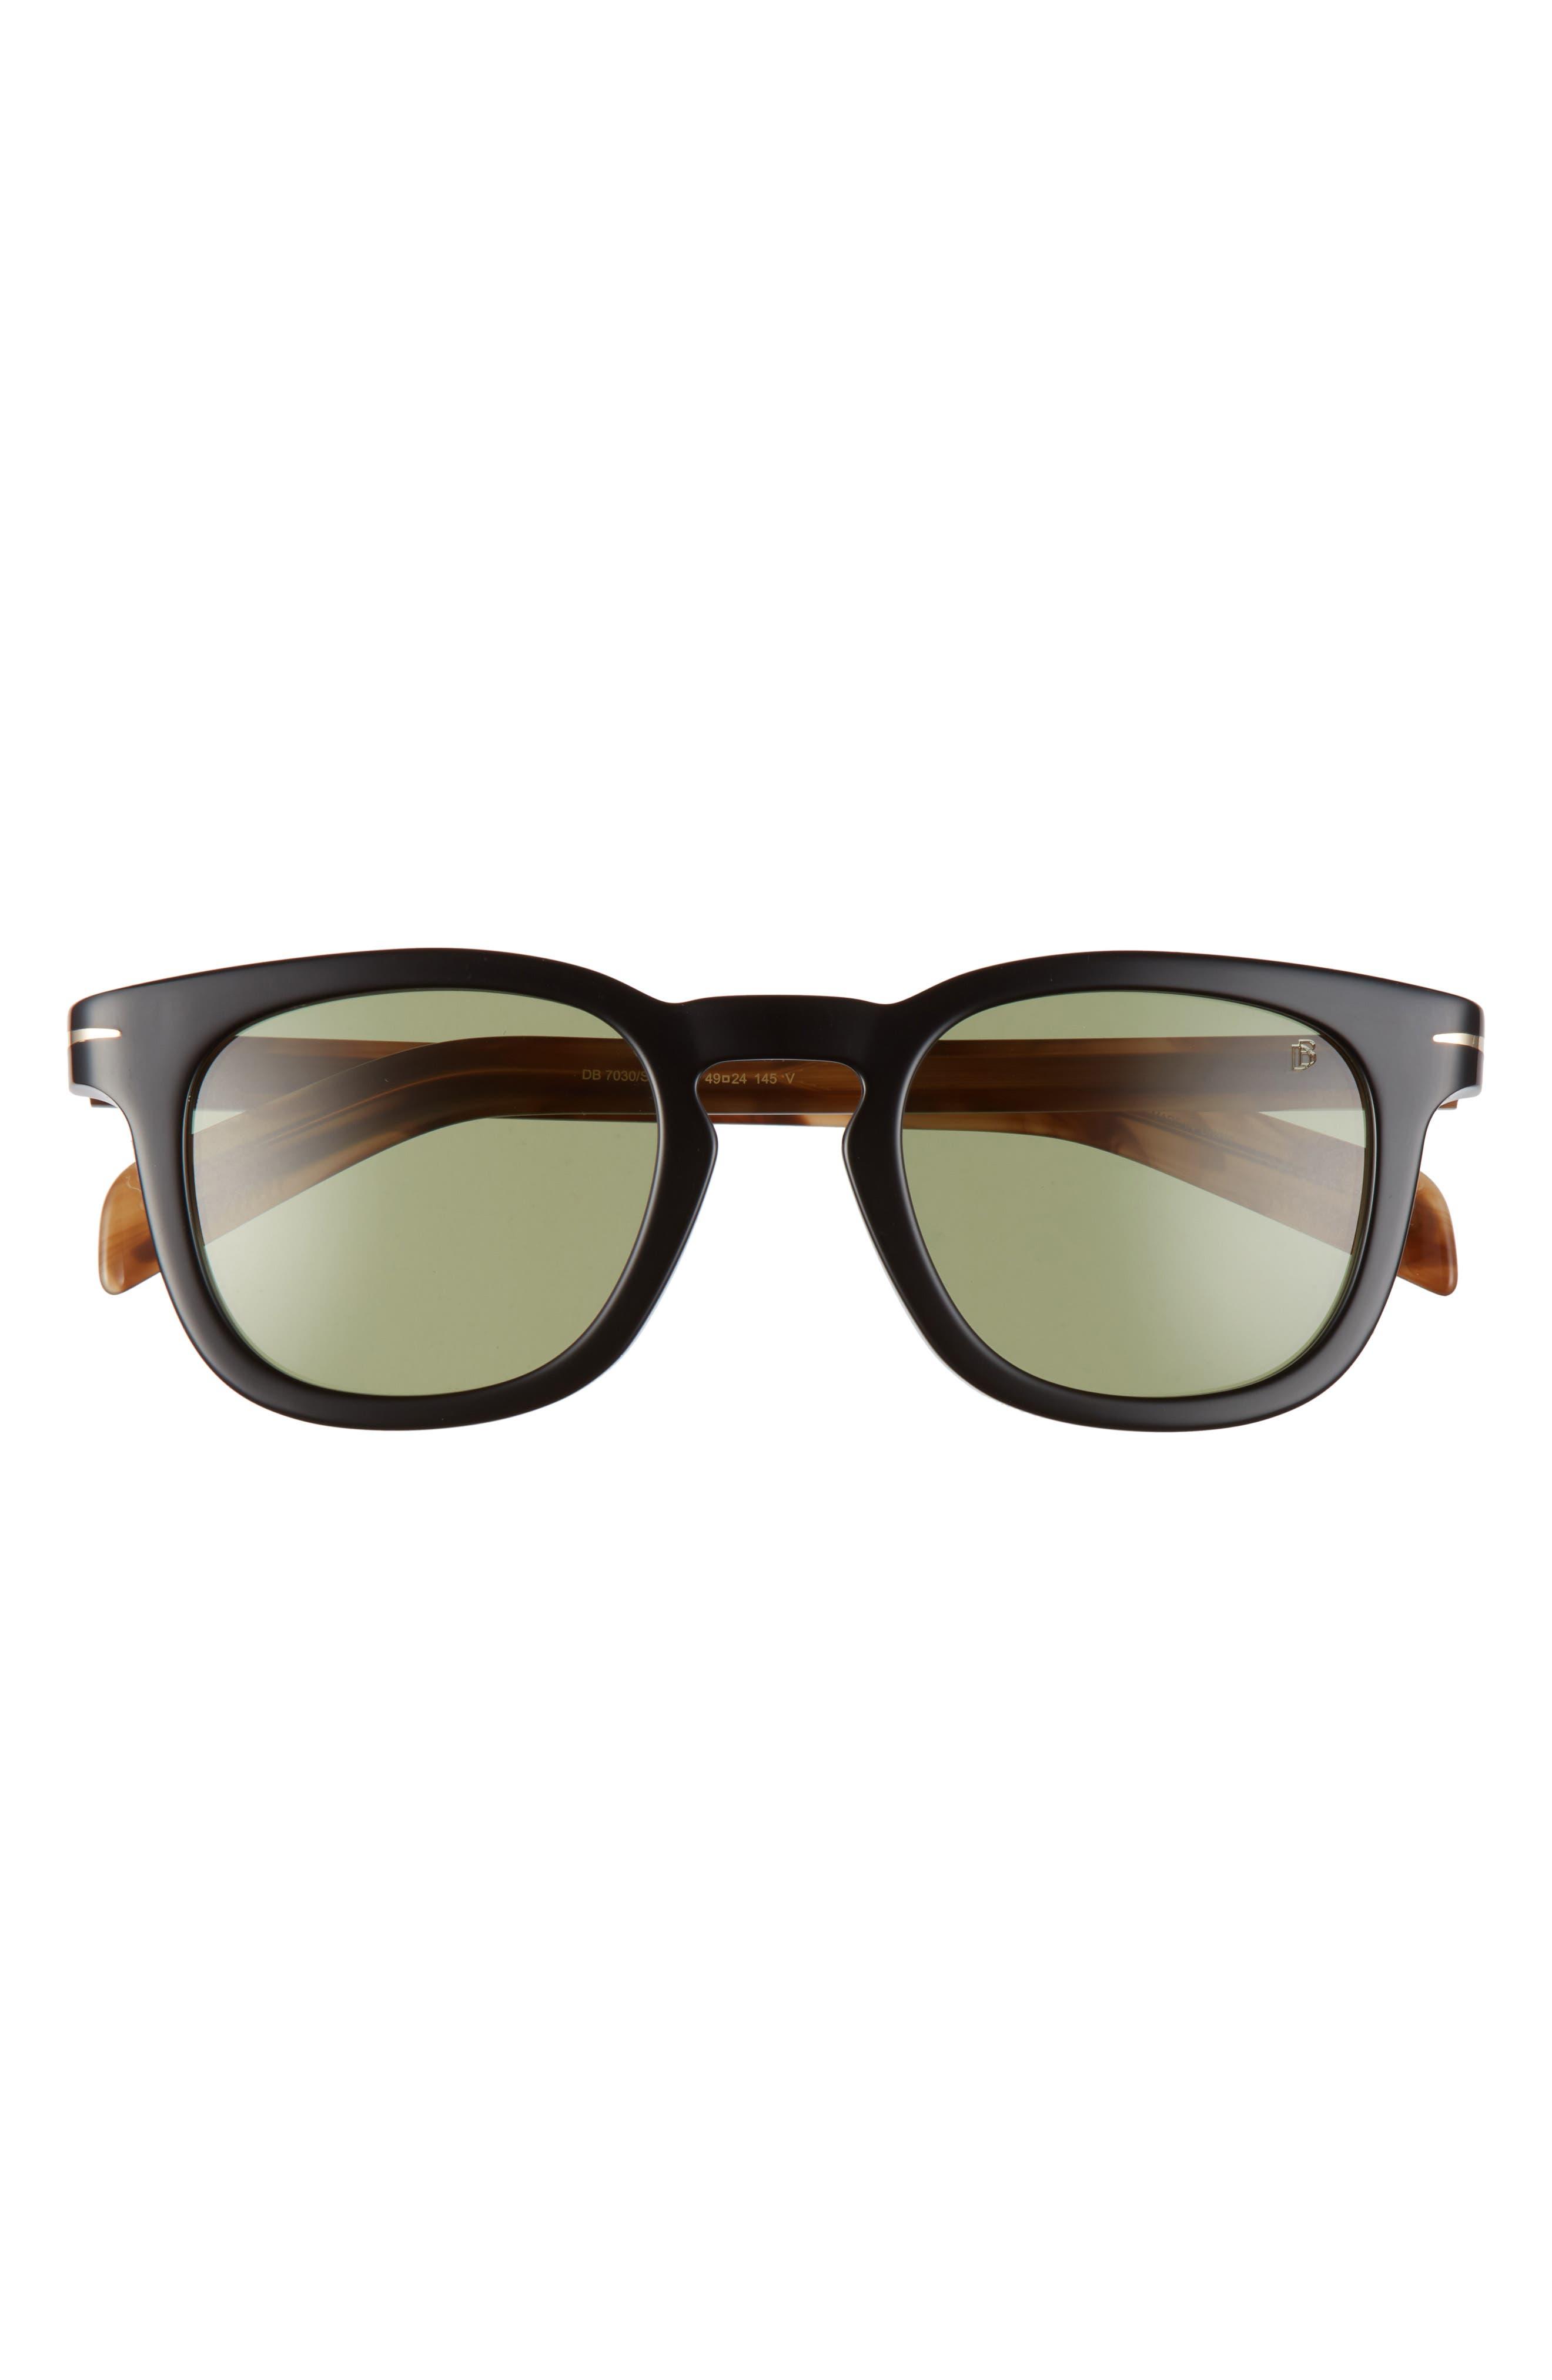 Men's Eyewear By David Beckham 49mm Square Sunglasses